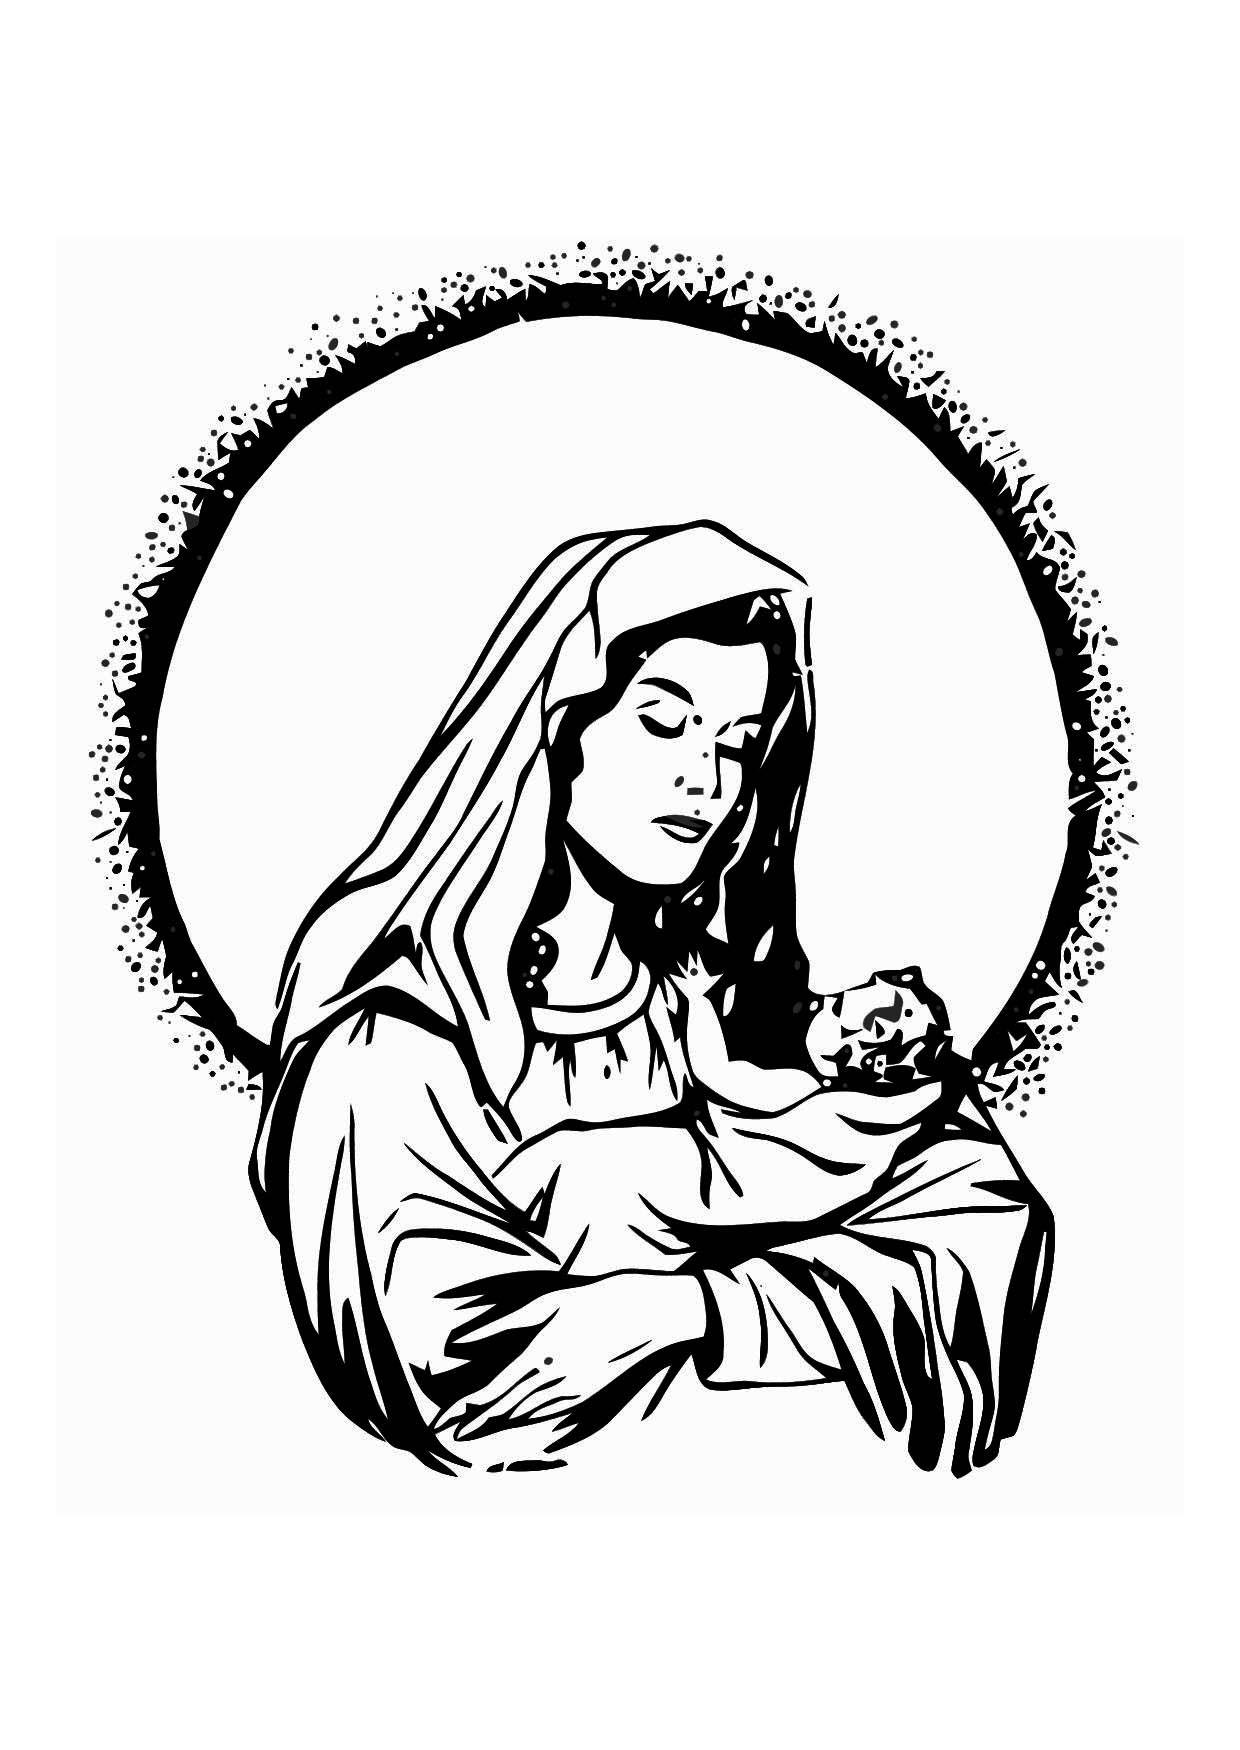 Disegno da colorare maria e ges cat 11344 - Child jesus images download ...